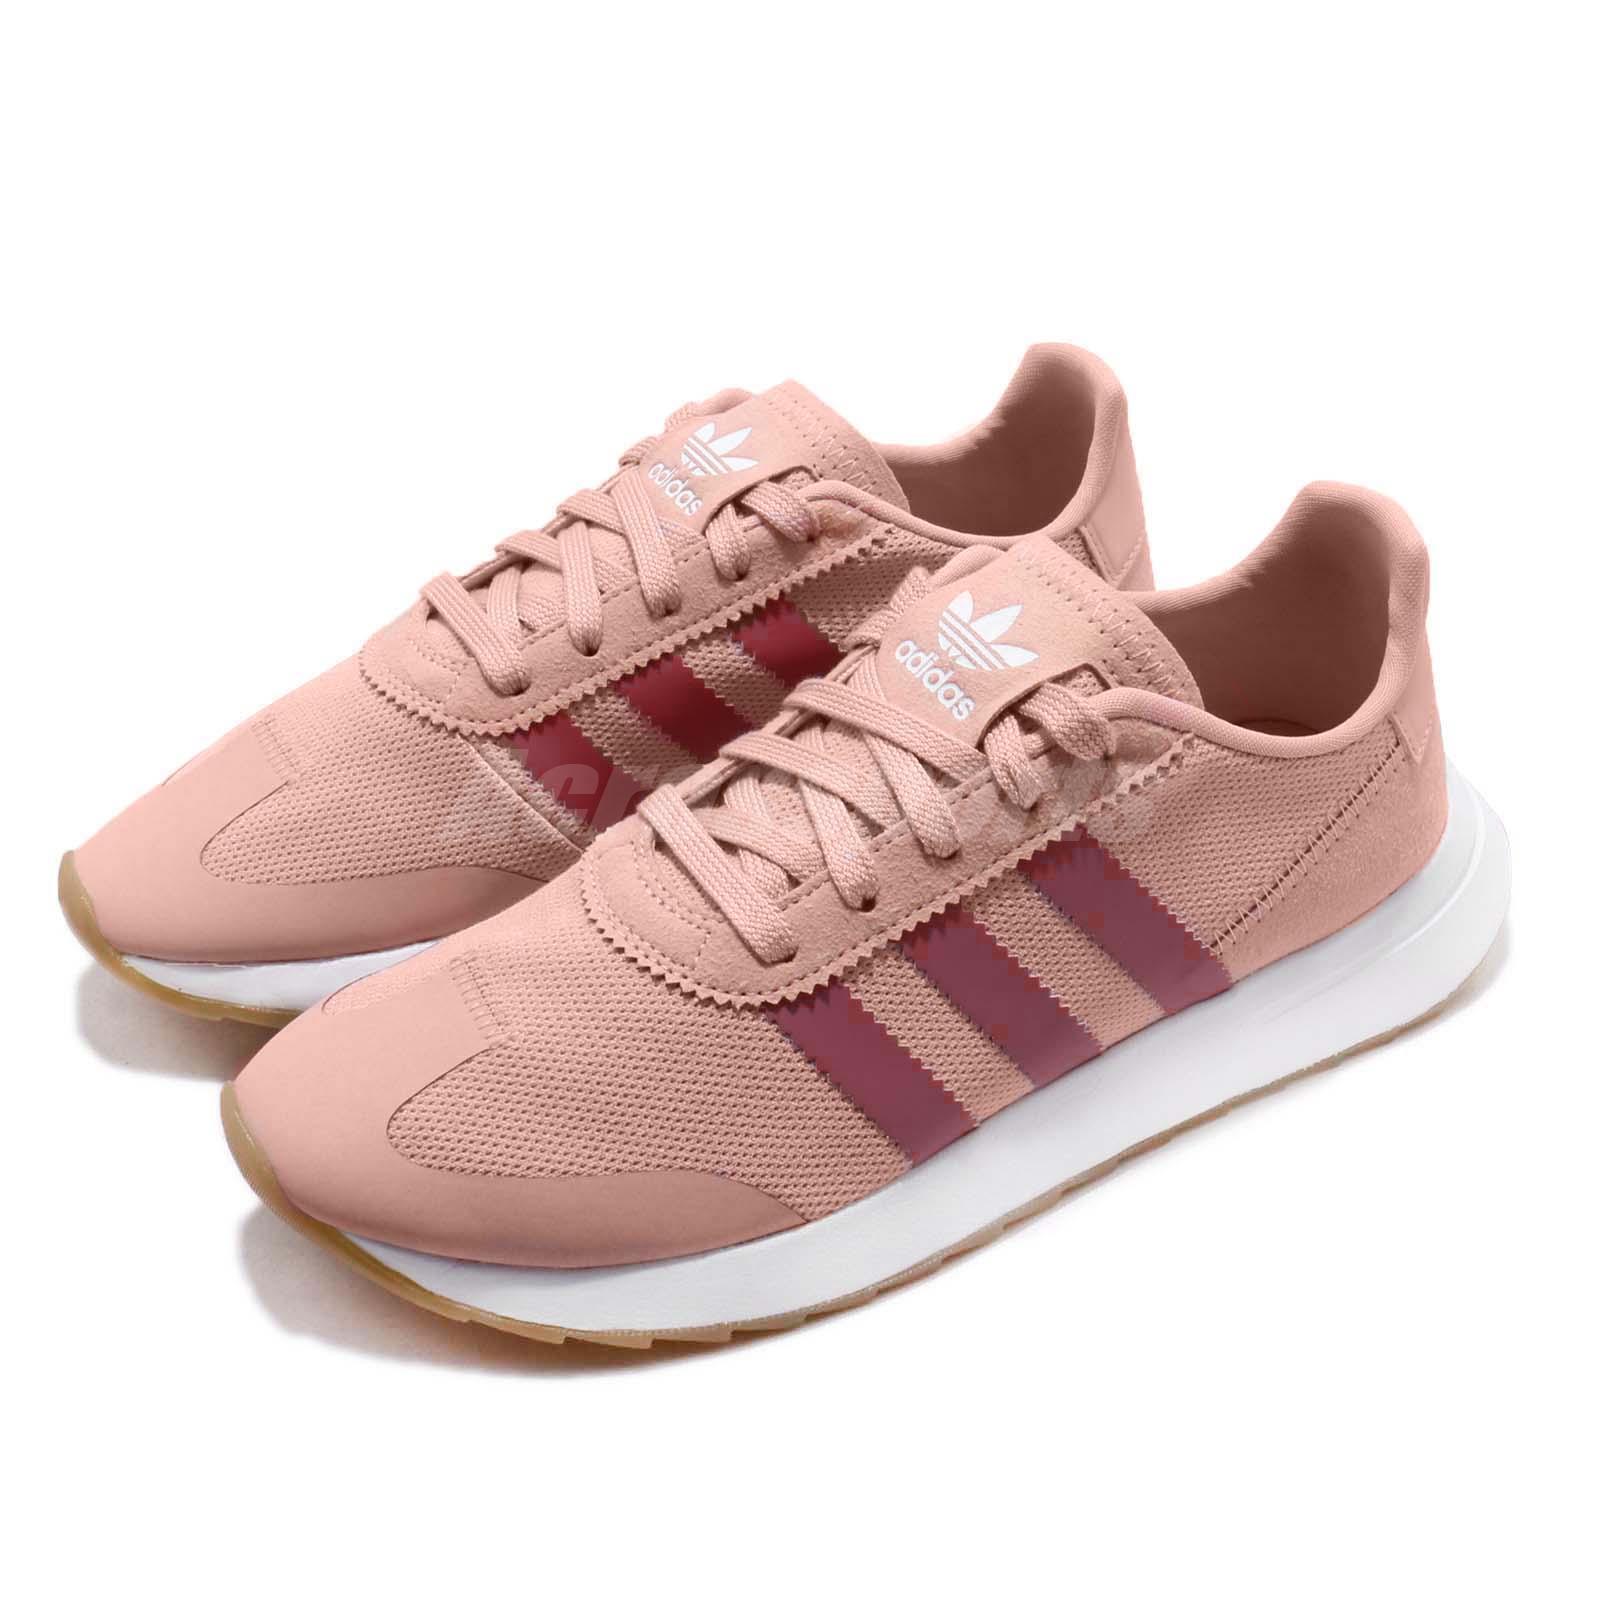 adidas flb_runner w